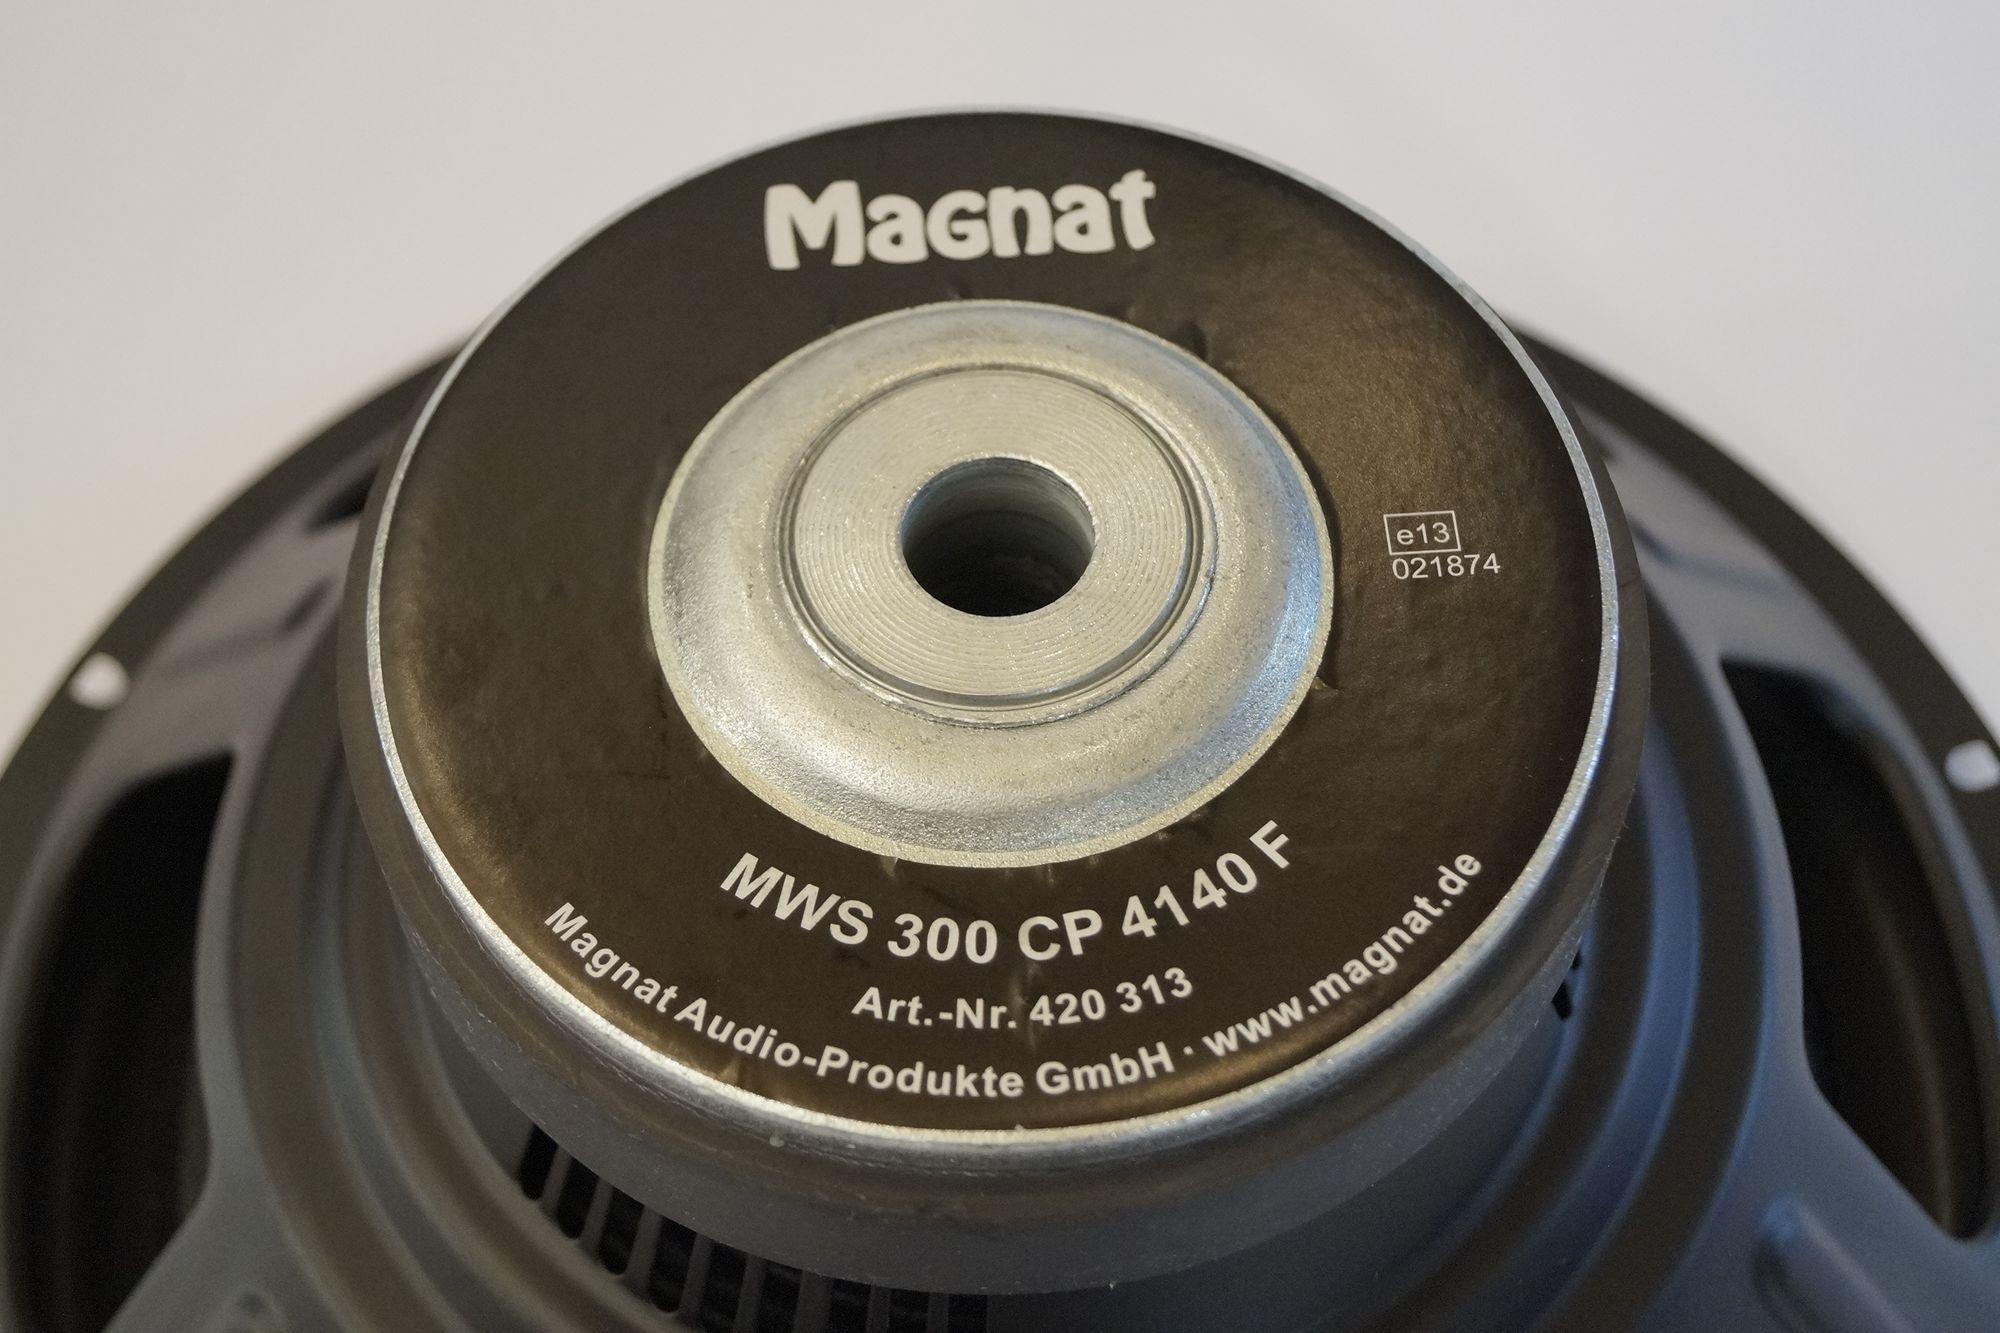 "12"" 30 cm Subwoofer Magnat Charger 130 MWS 300 CP 4140 F, Basslautsprecher/Tieftöner – Bild 3"